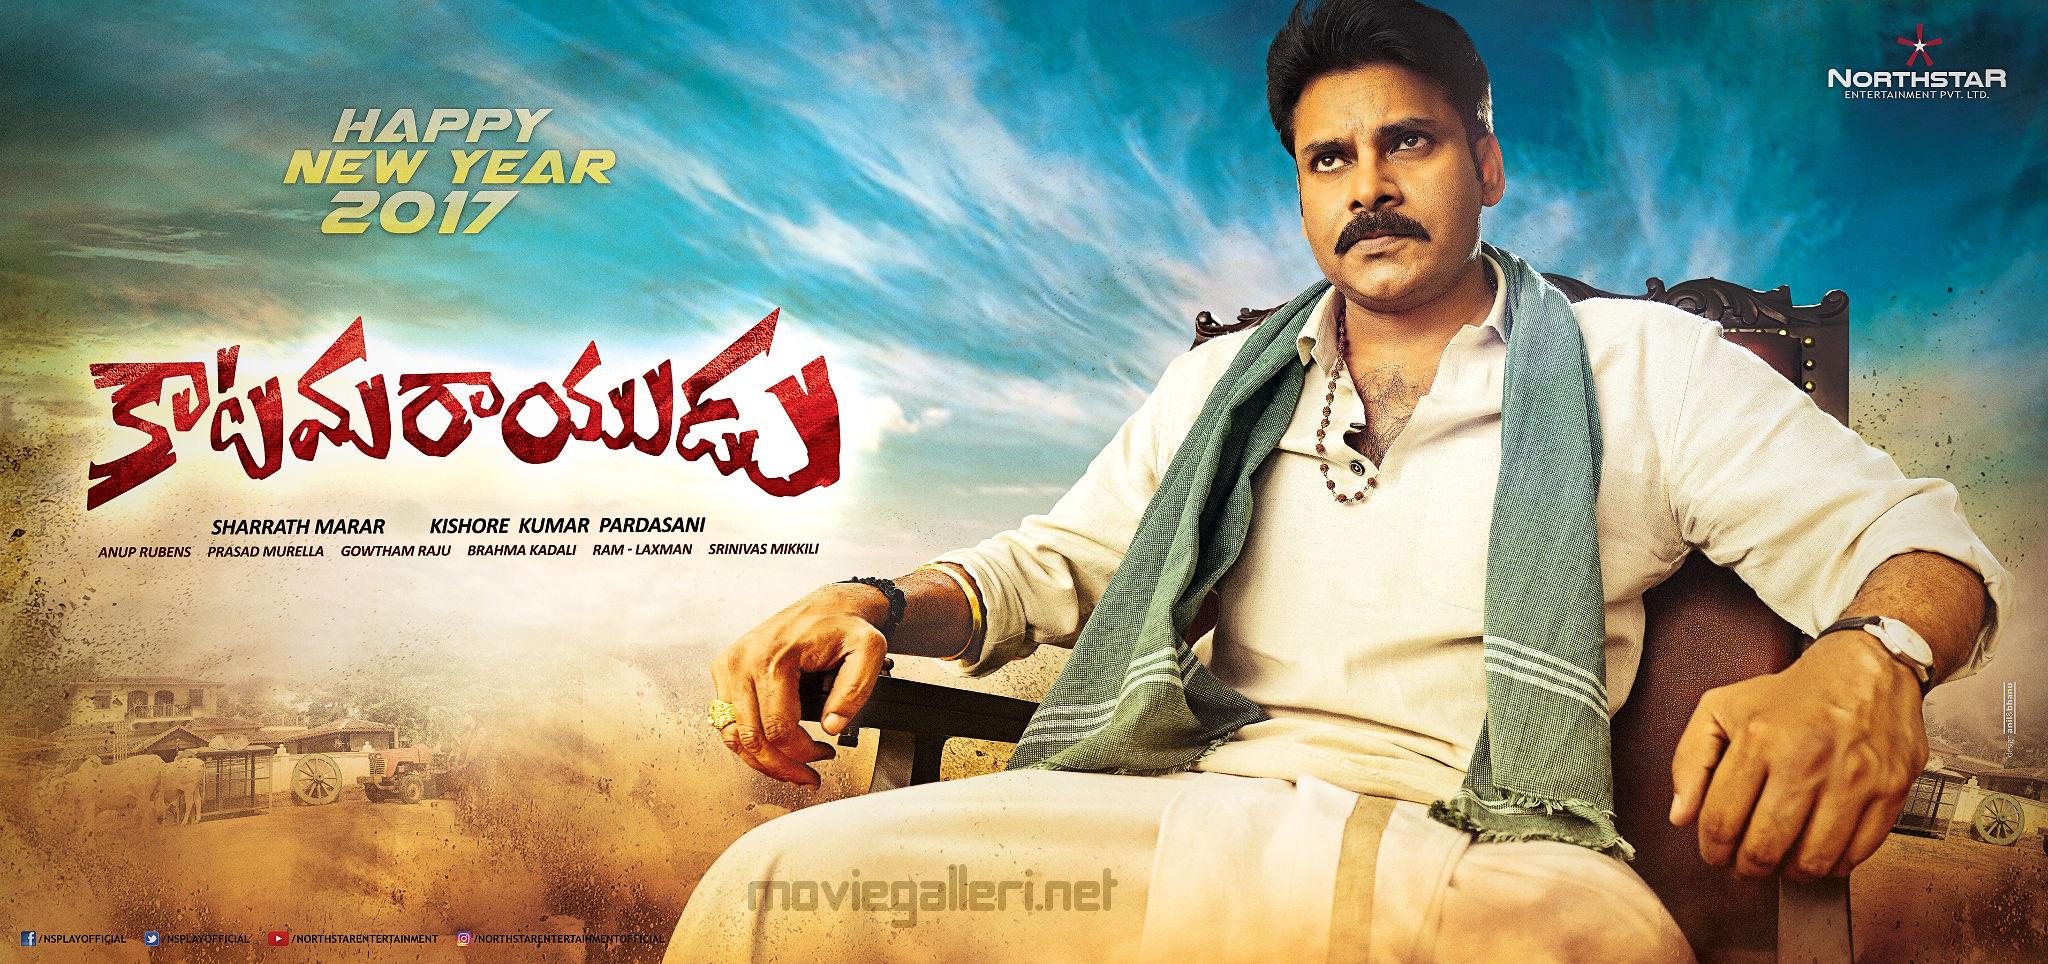 Pawan Kalyans Katamarayudu Movie Wallpaper New Movie Posters